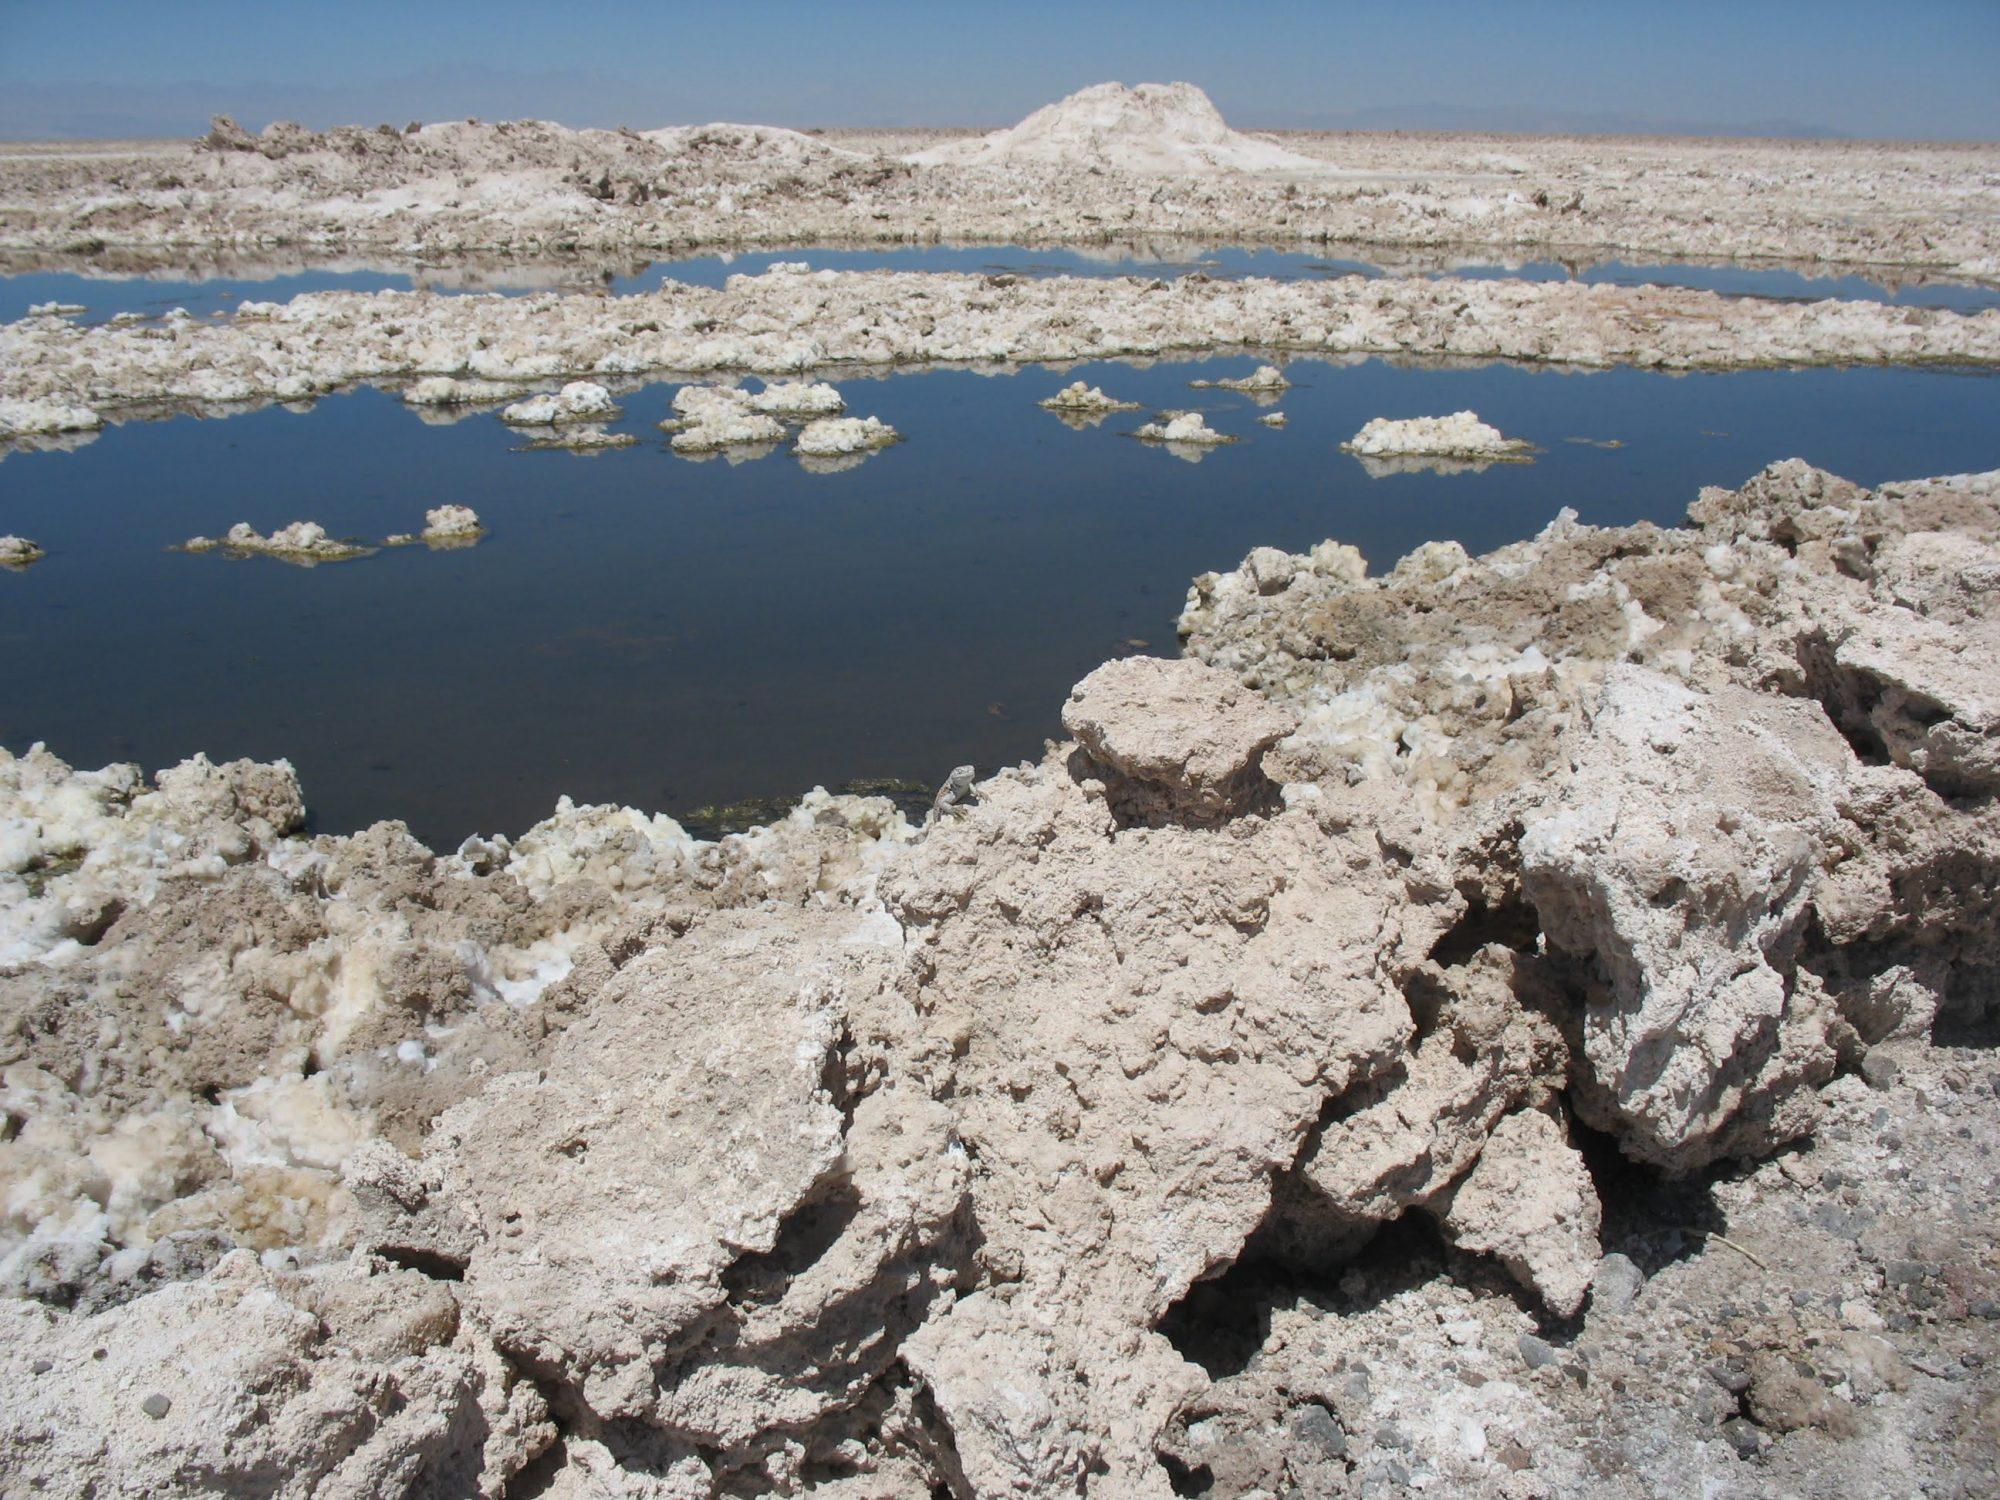 Chile San Pedro Atacama - Salar / Salt Lake